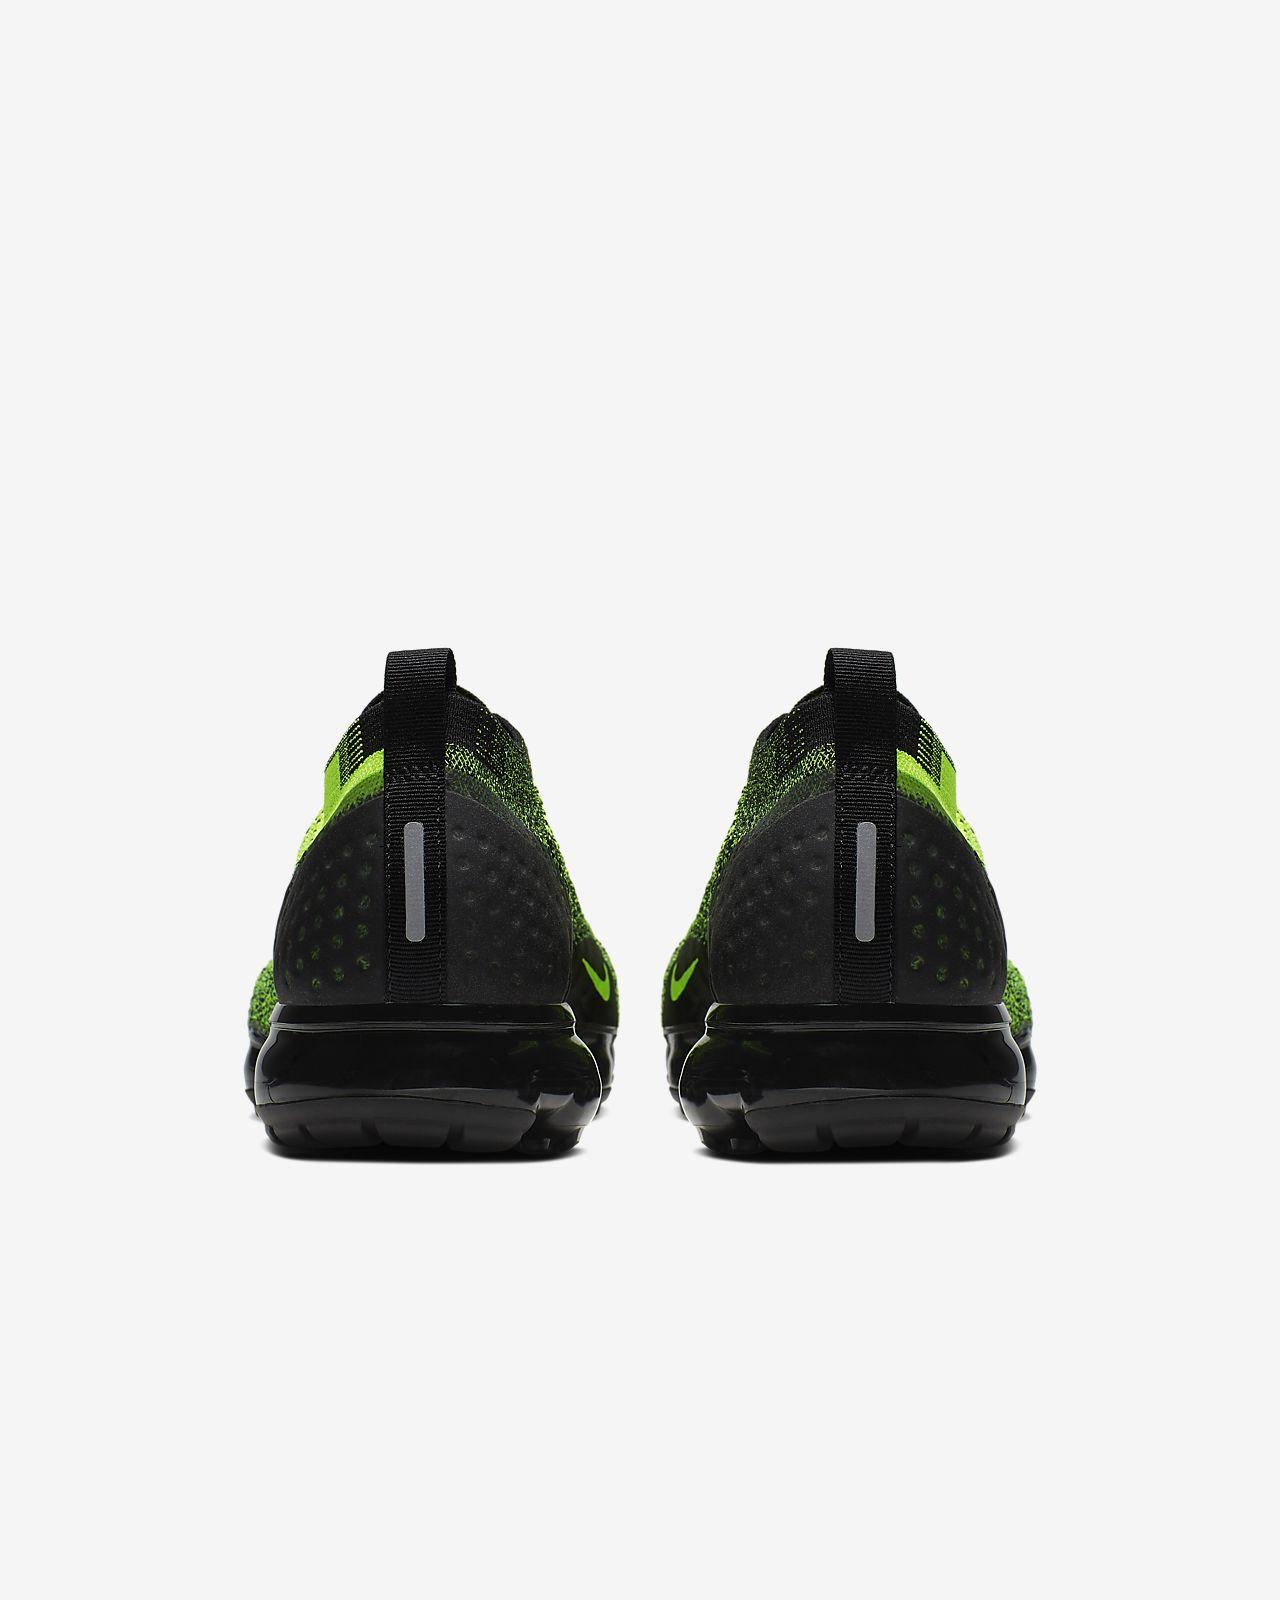 022b0e7fa89e Nike Air VaporMax Flyknit 2 Shoe. Nike.com ID